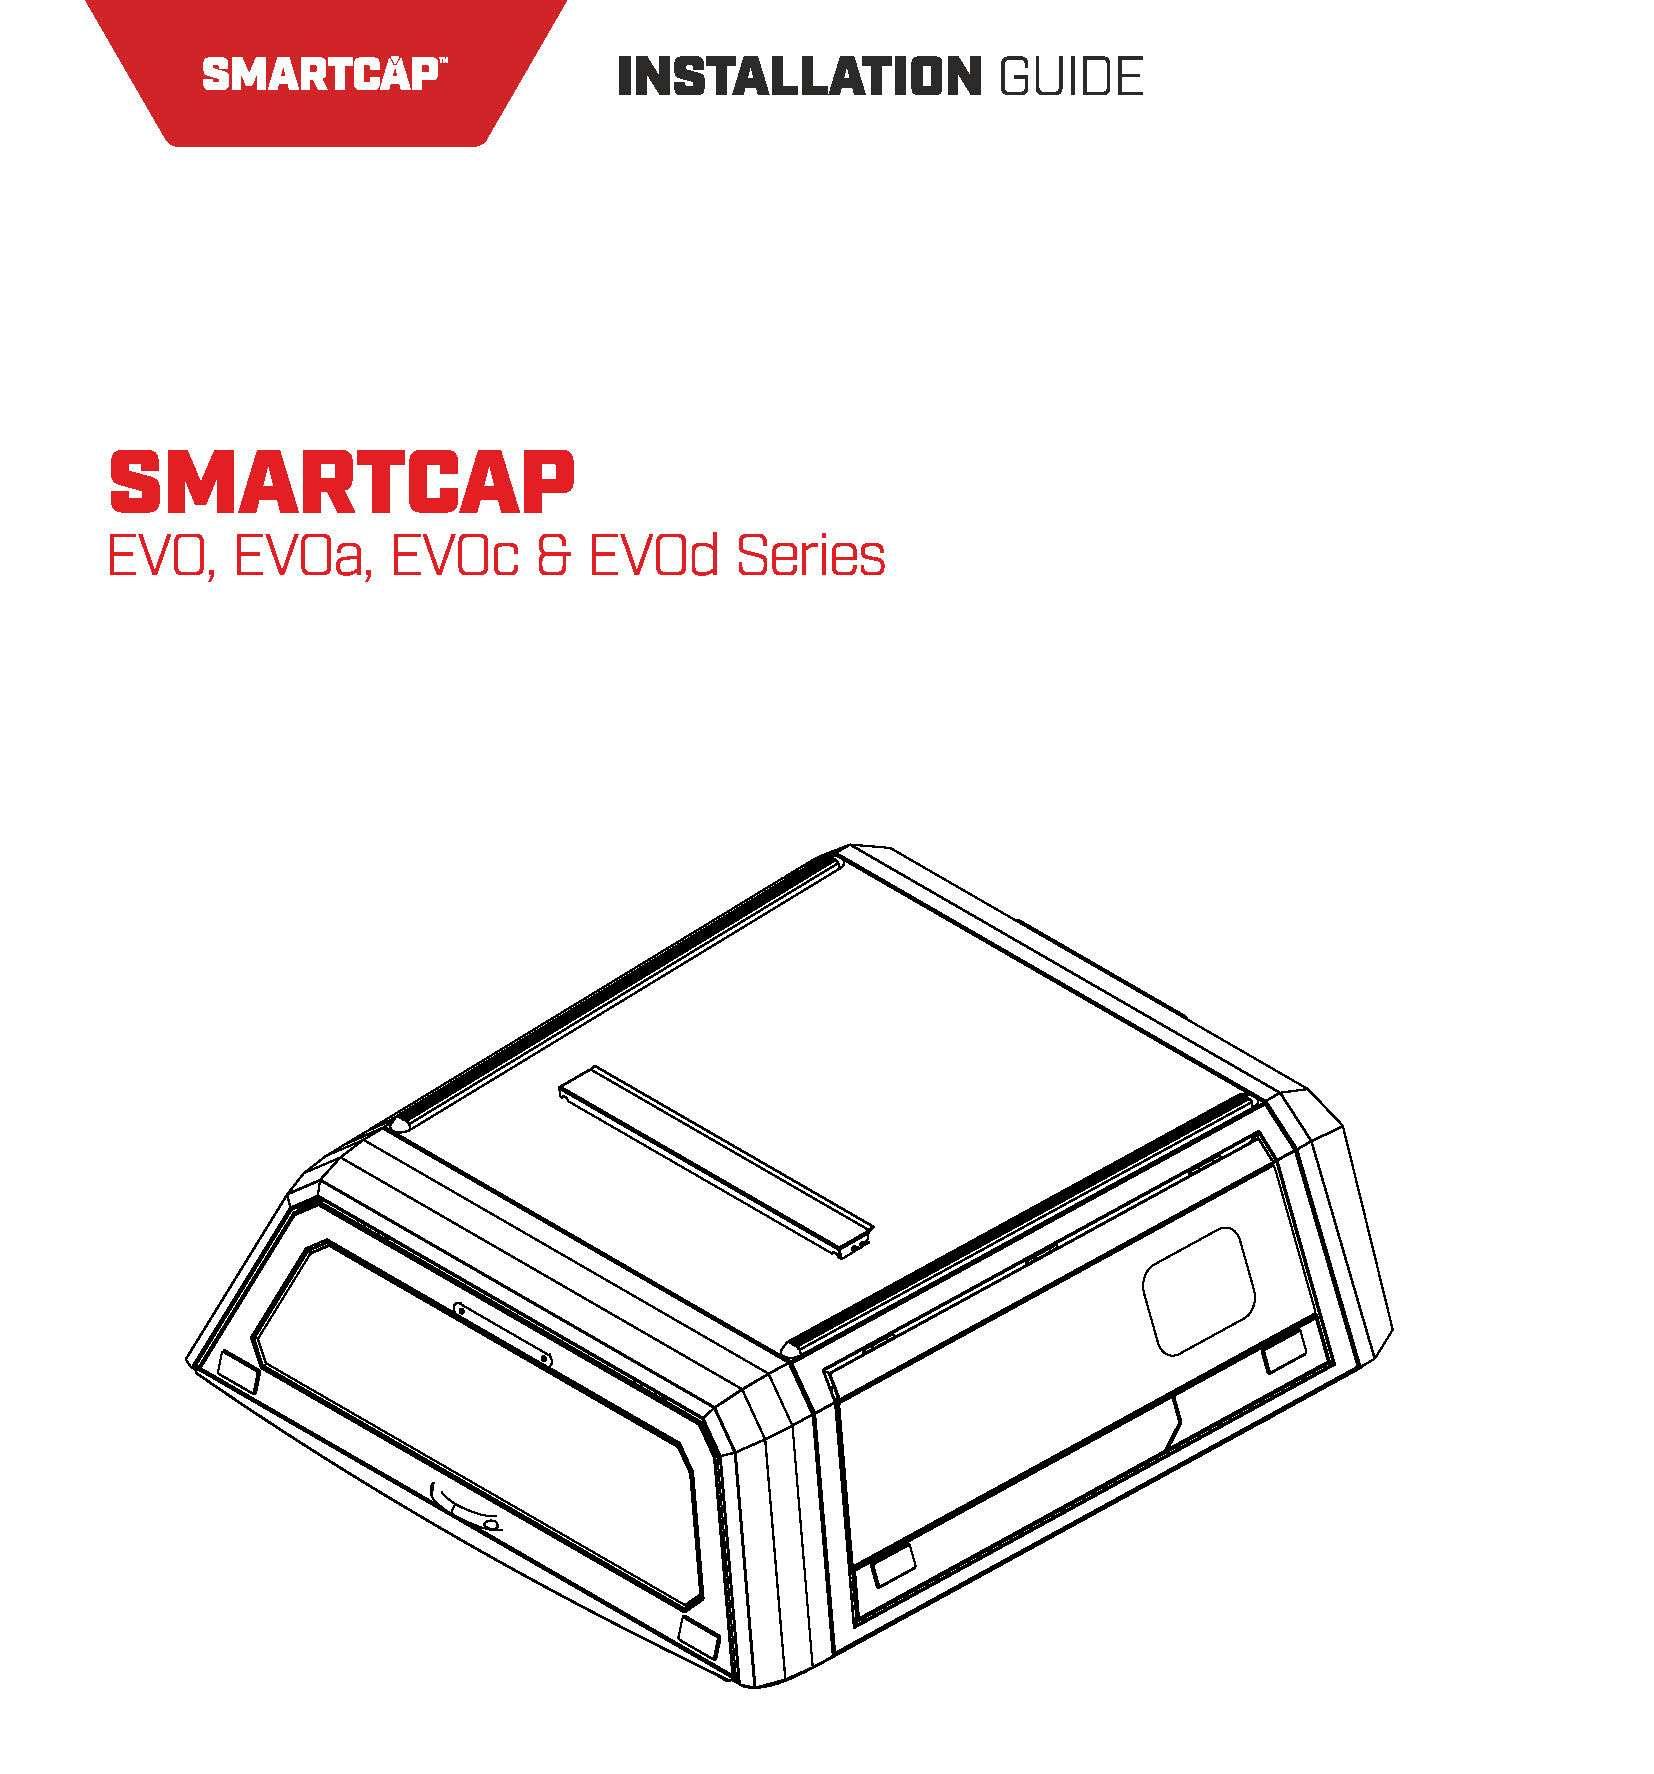 SmartCap EVOc Installation Guide